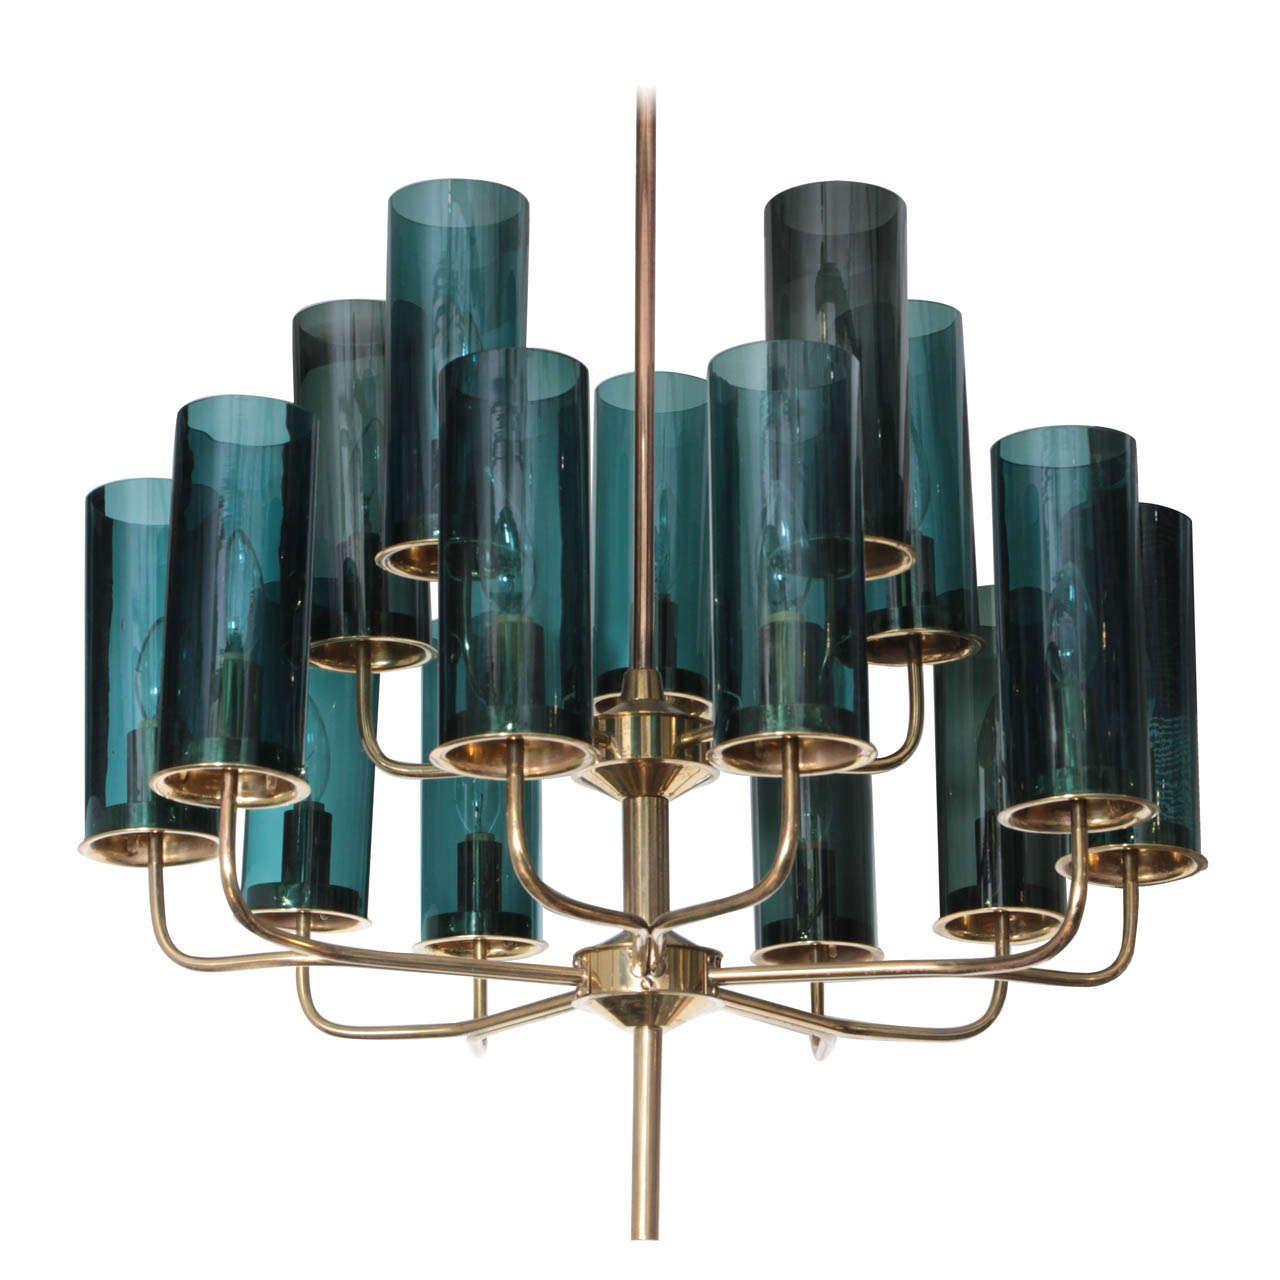 FLODEAU.COM - Handblown Glass Lighting by Rothschild Bickers 02 ...